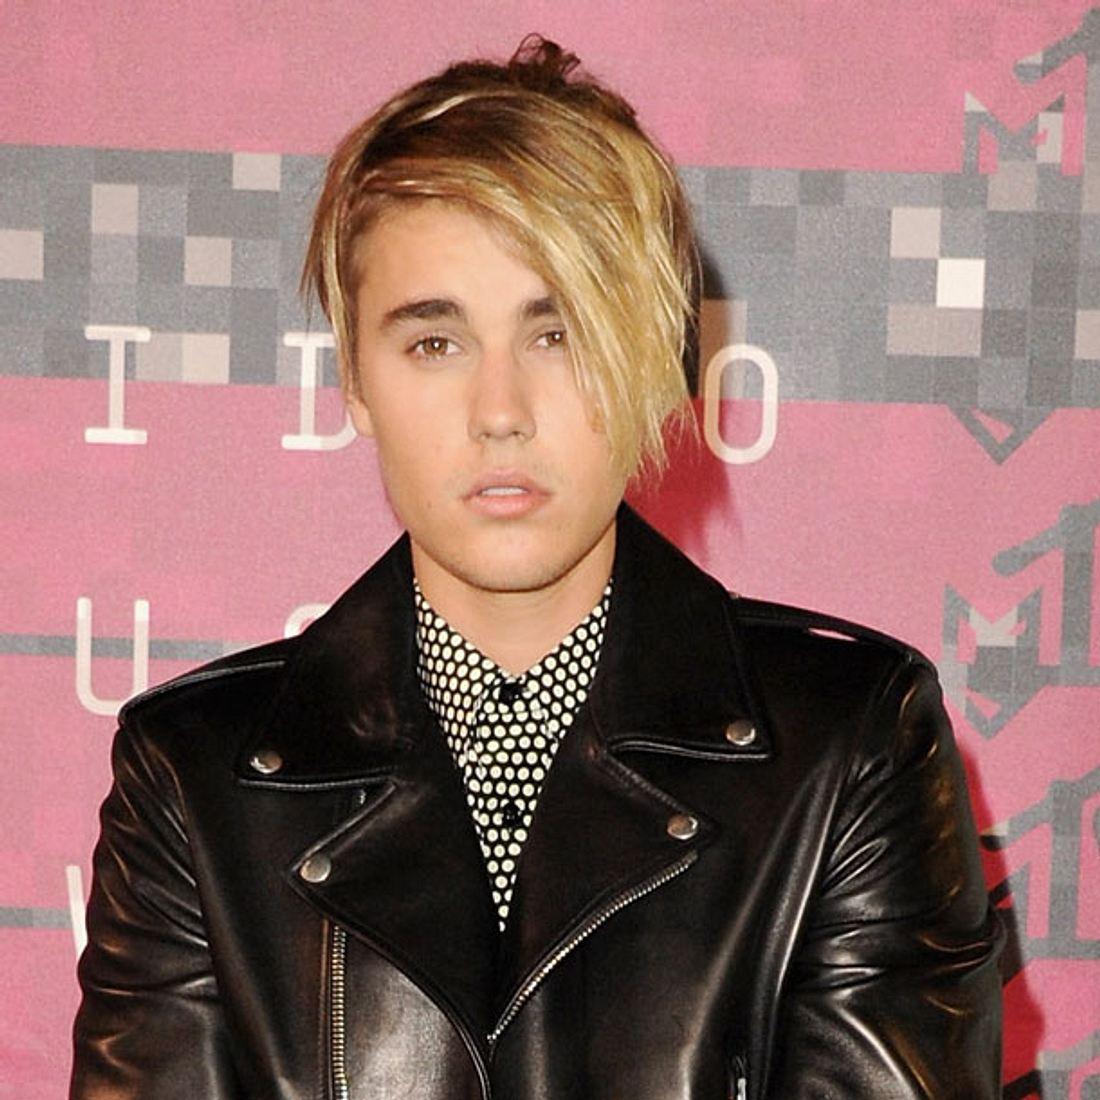 Justin Bieber Frisur